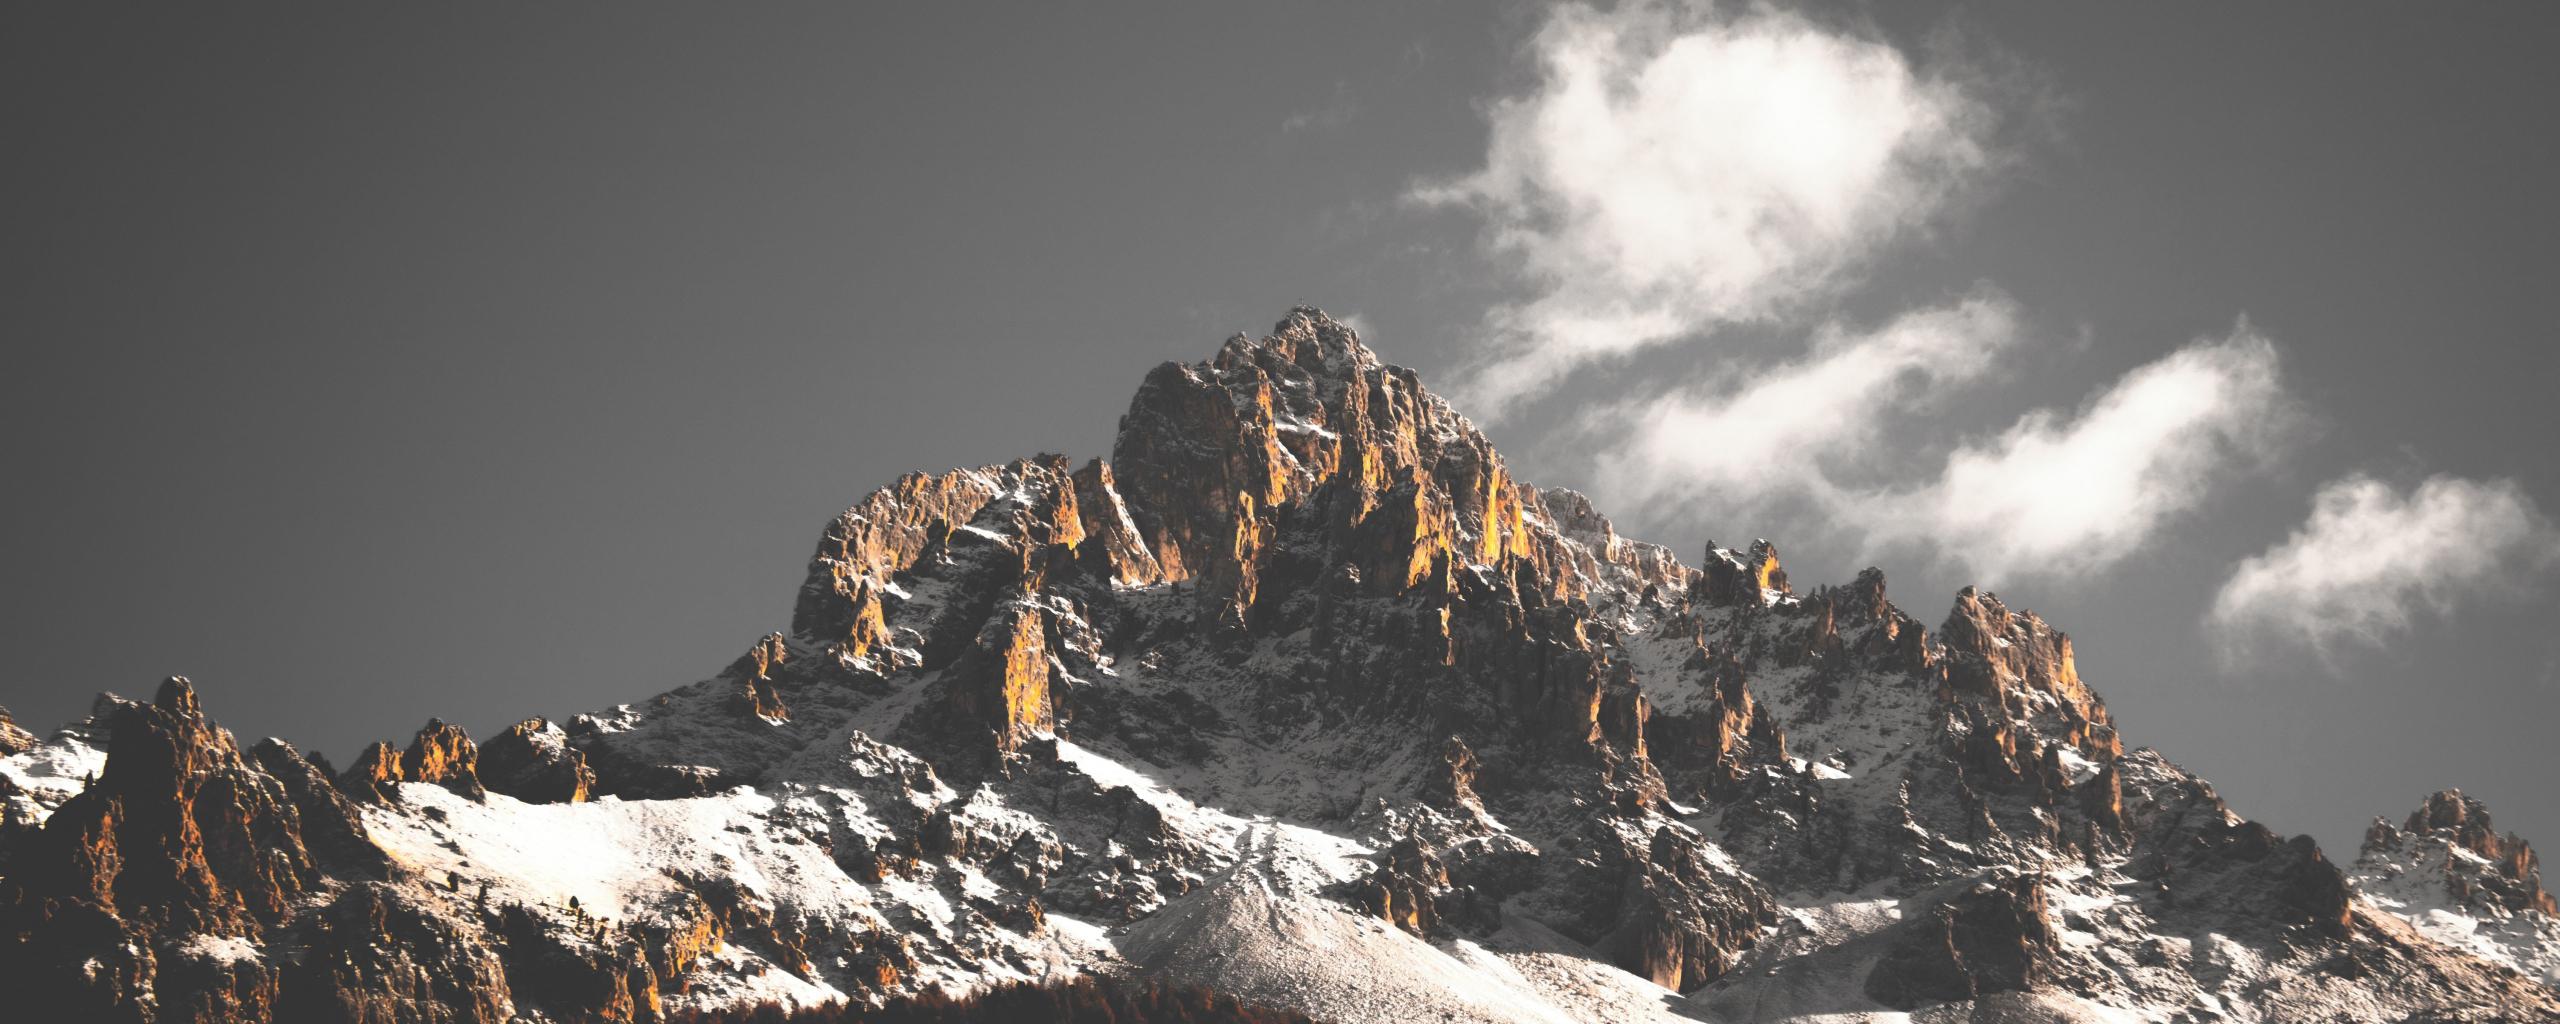 2560x1024 wallpaper Mountains, cliffs, nature, tree, 5k